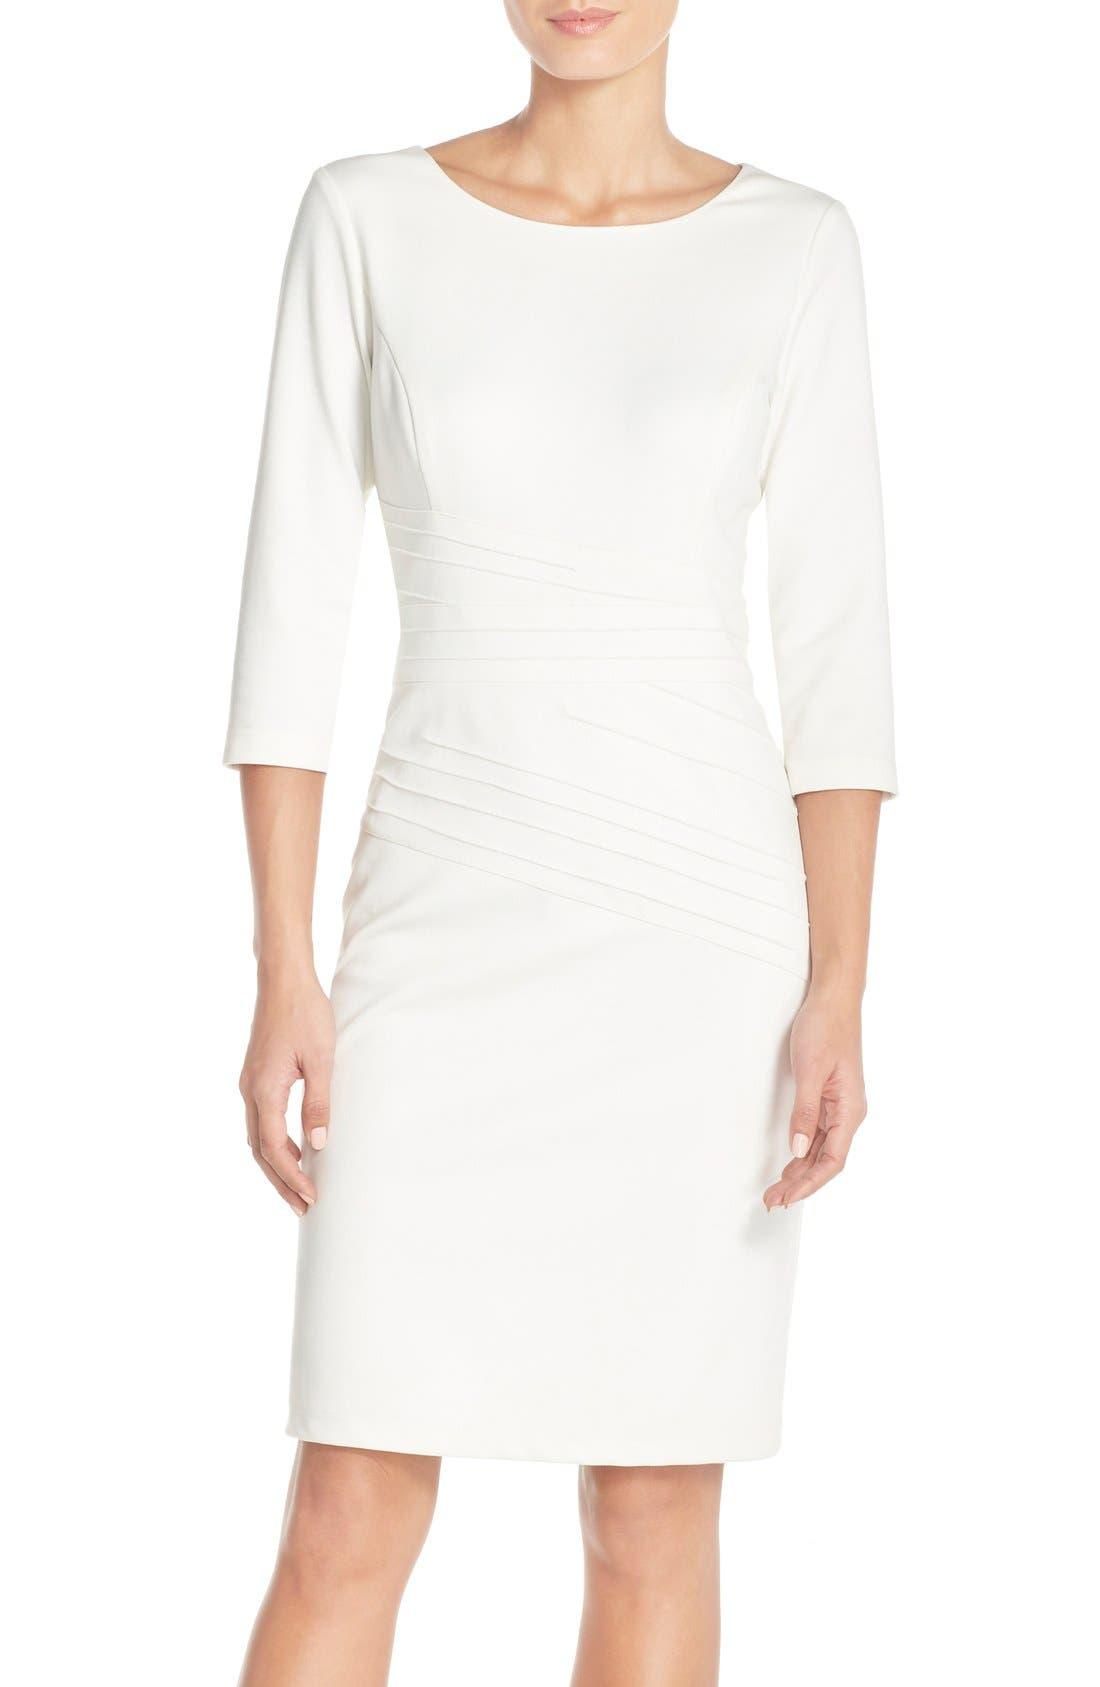 Alternate Image 1 Selected - Ellen Tracy Seamed PonteSheath Dress (Regular & Petite)